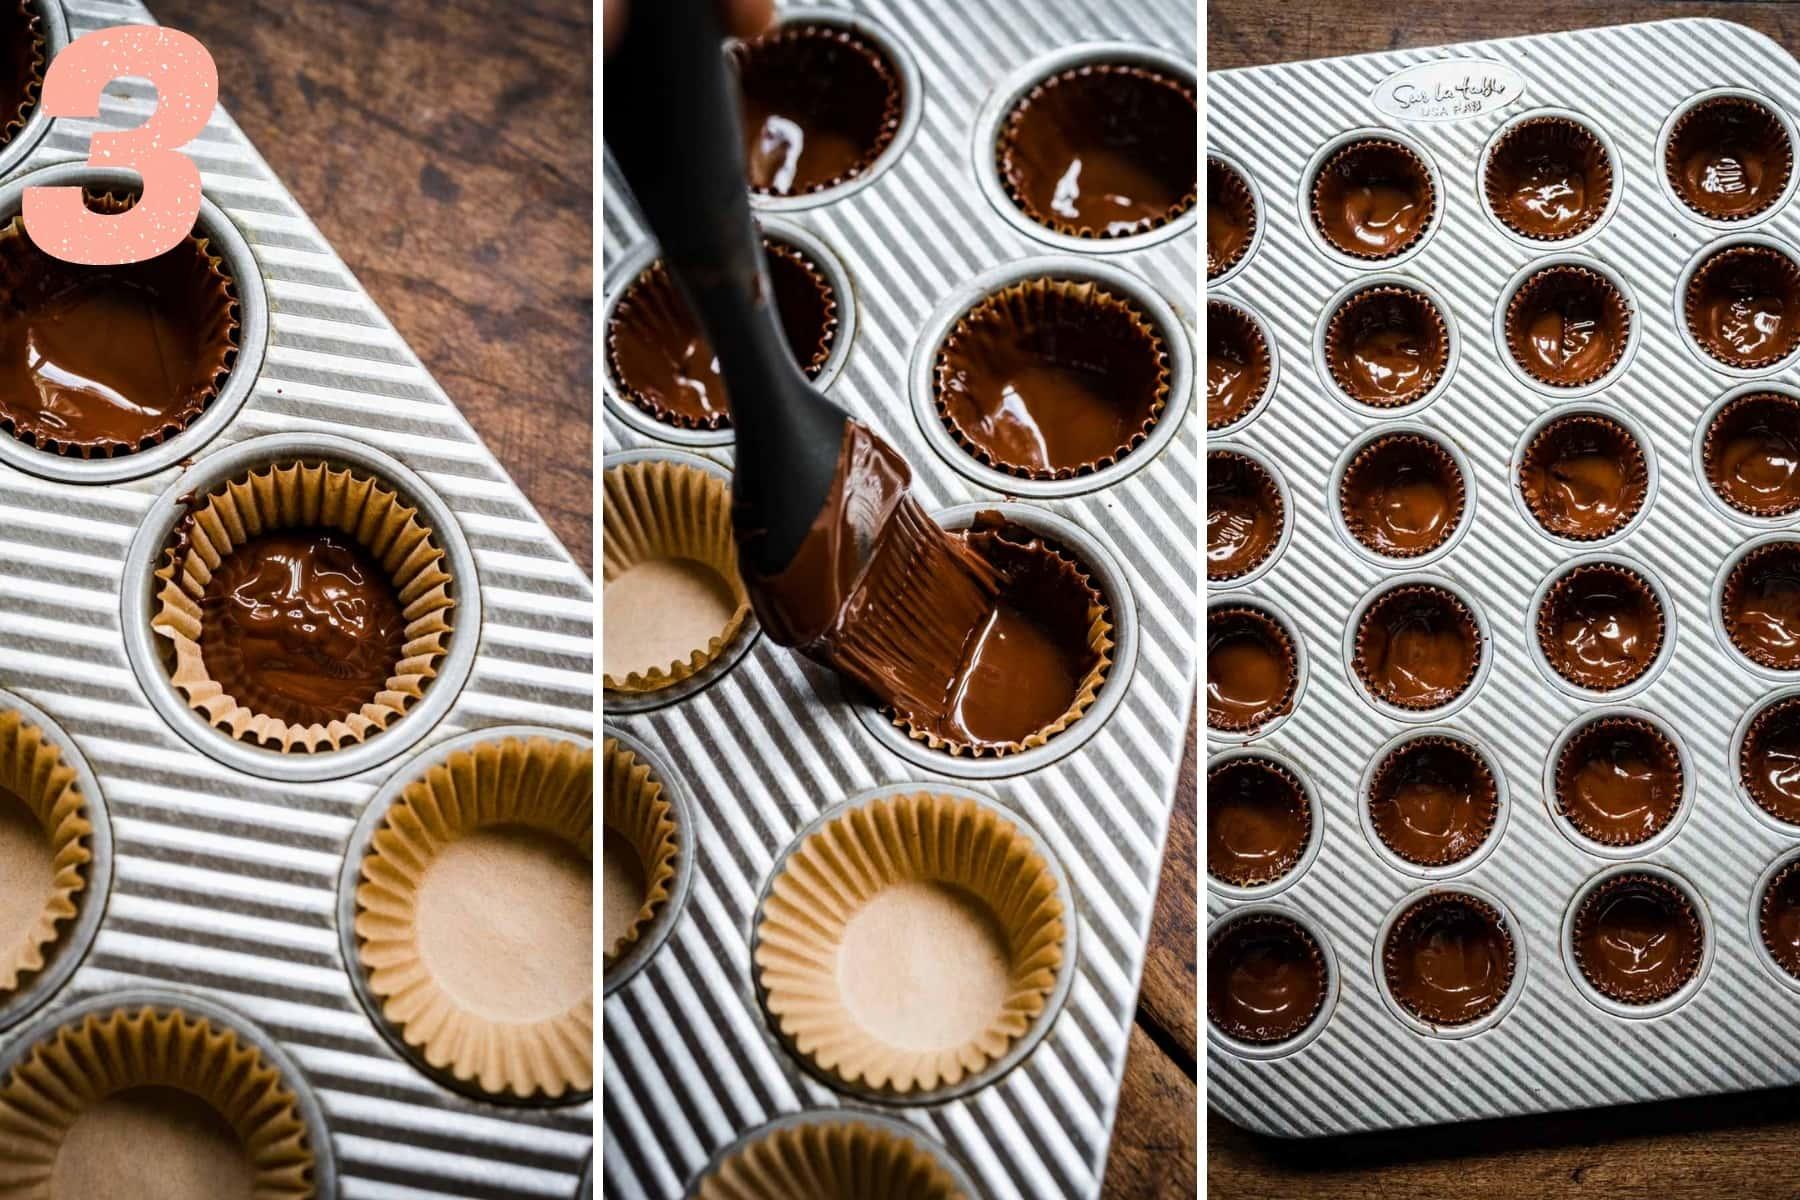 three photos showing brushing dark chocolate up the sides of mini muffin tins.